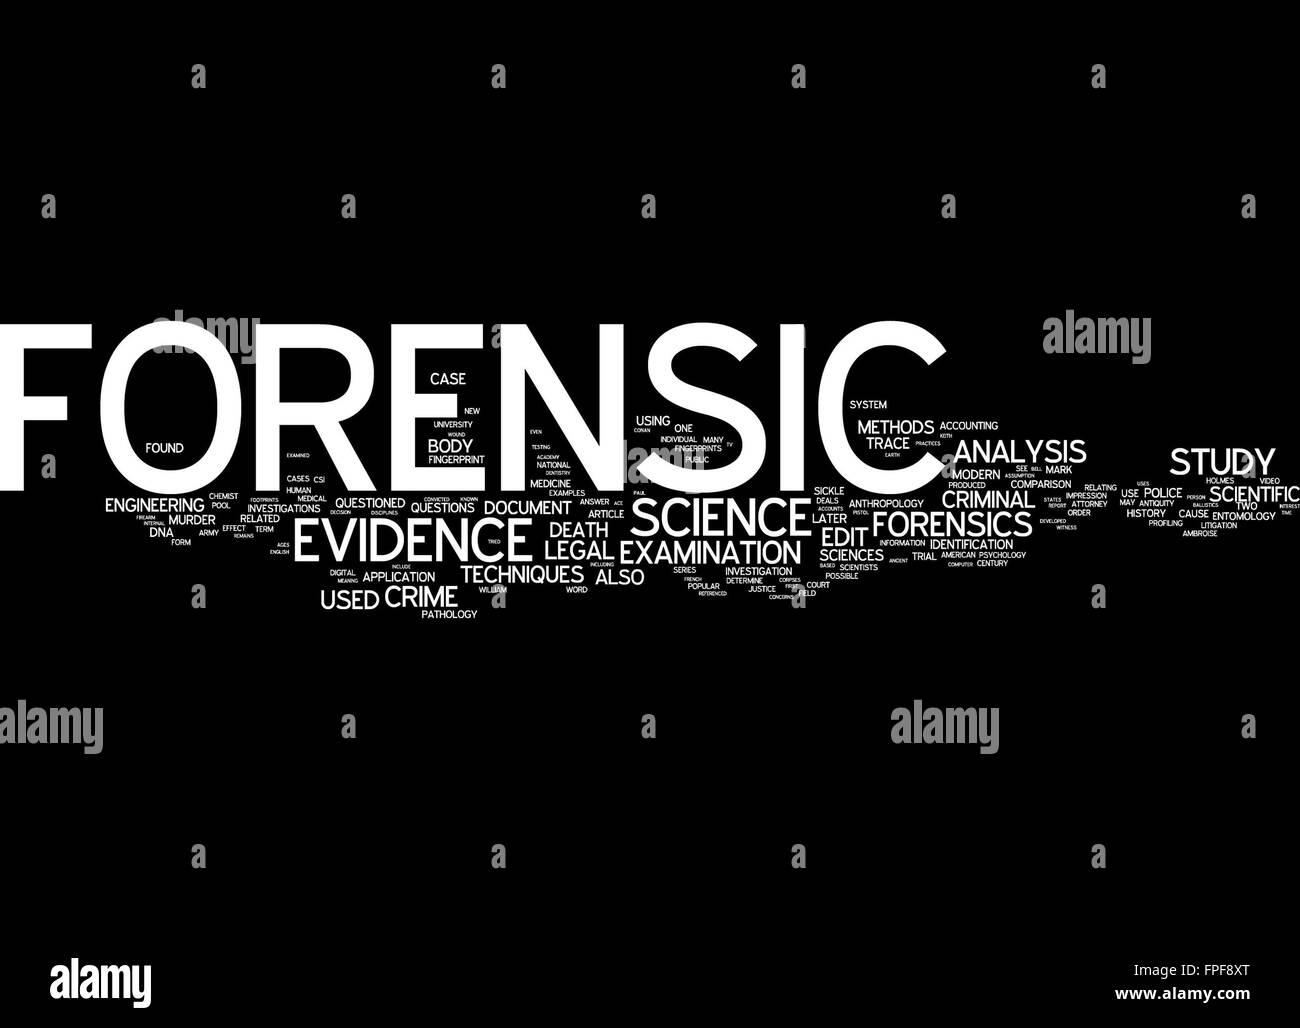 forensic science evidence analysis examination - Stock Image